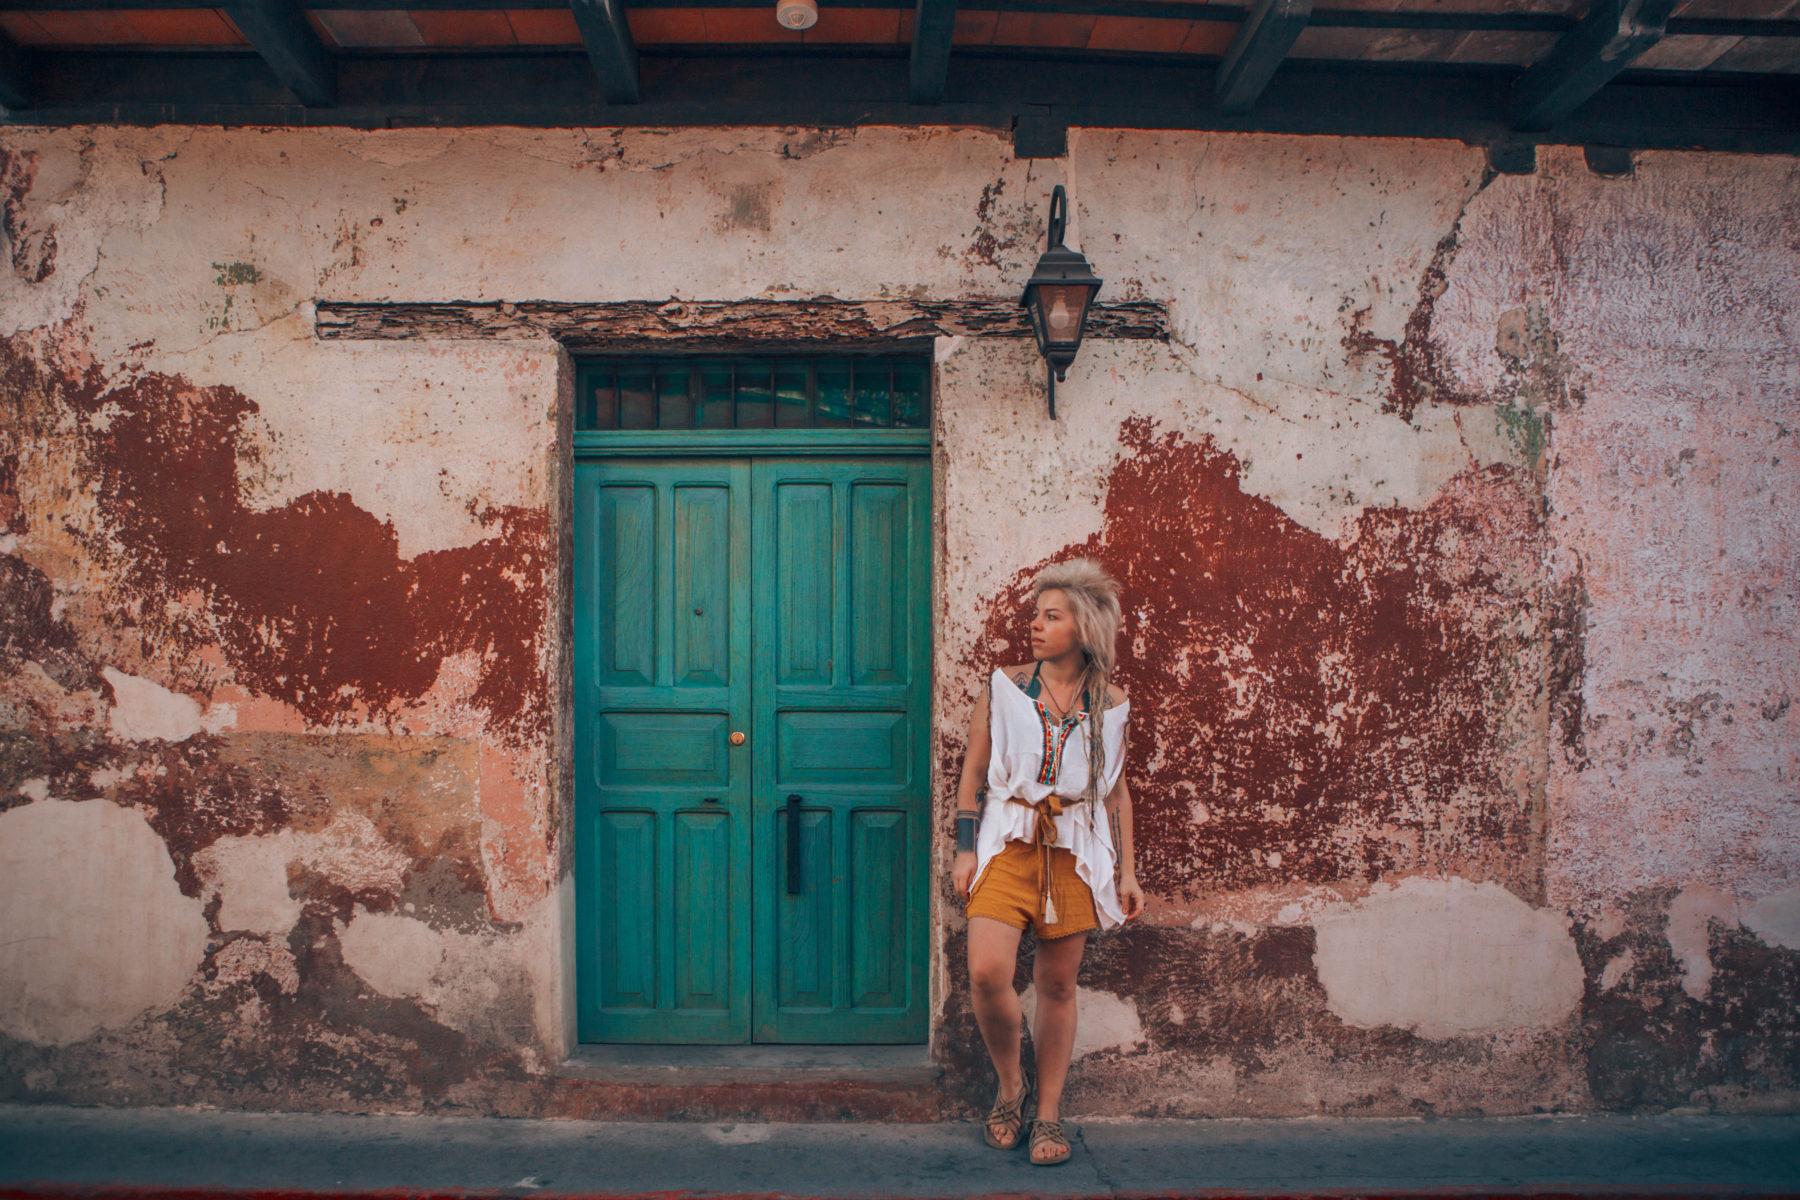 antigua guatemala colourful colonian central america local people volcano streets